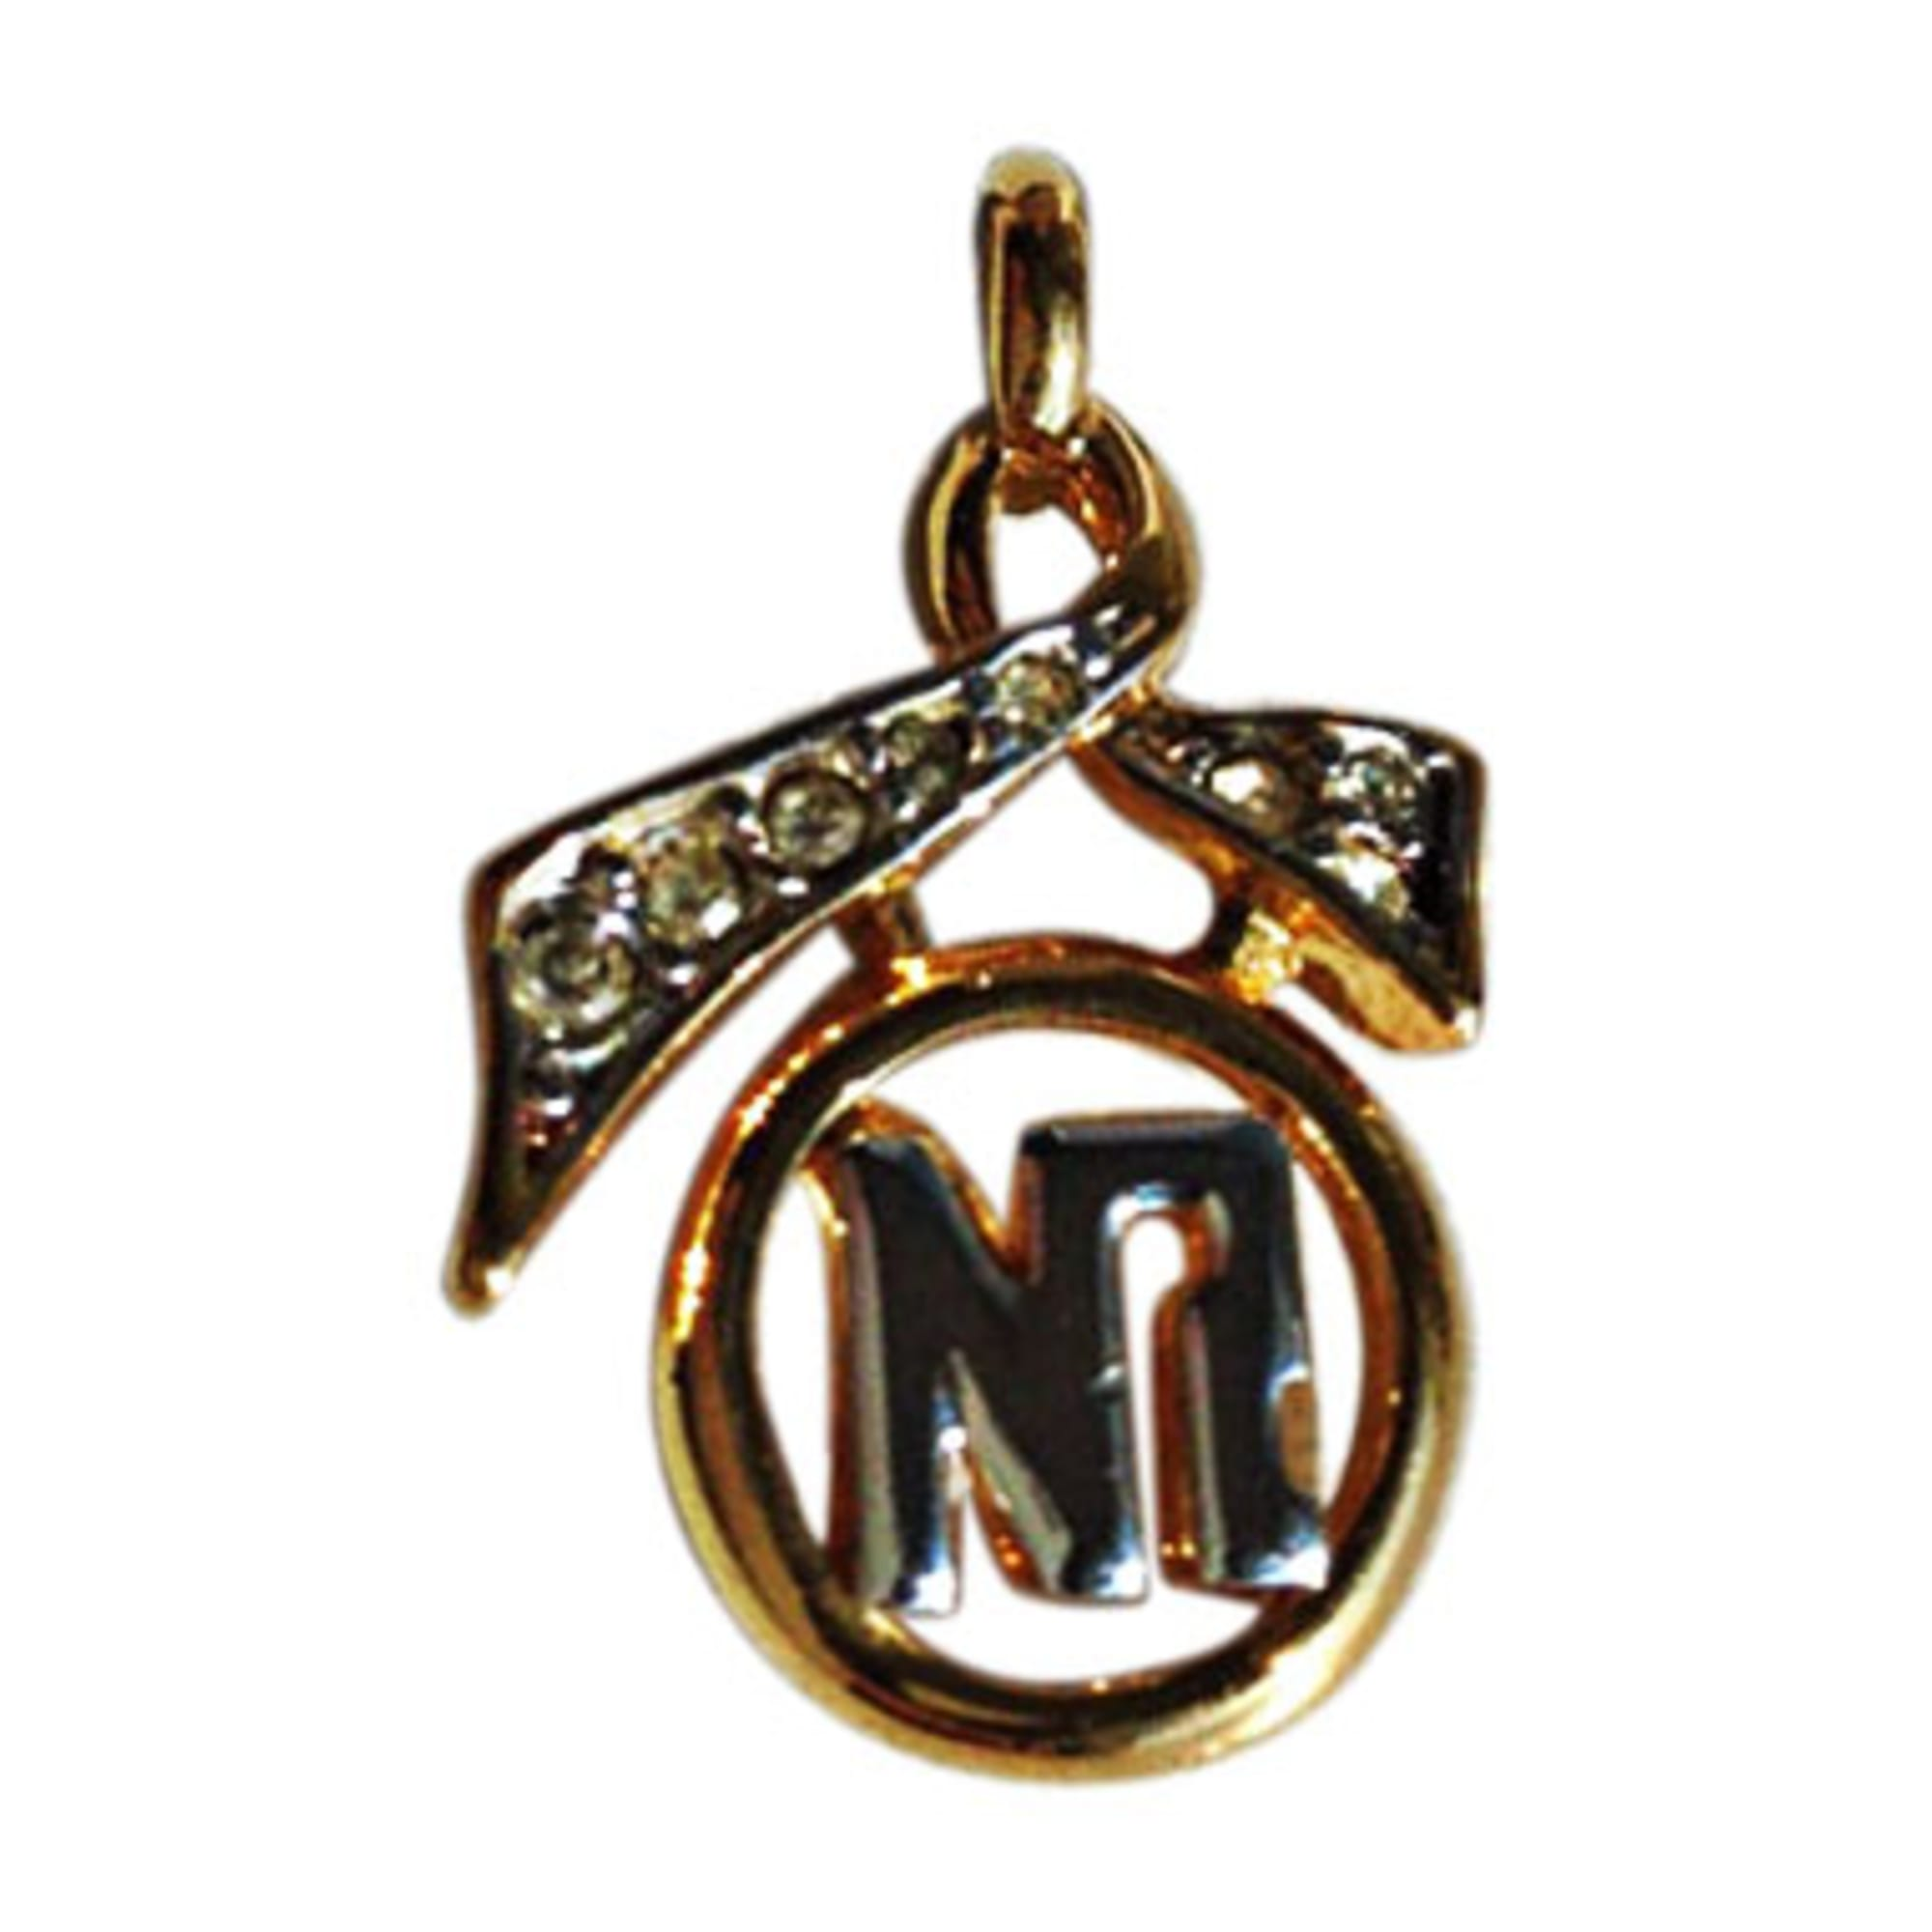 Pendentif, collier pendentif NINA RICCI Doré, bronze, cuivre